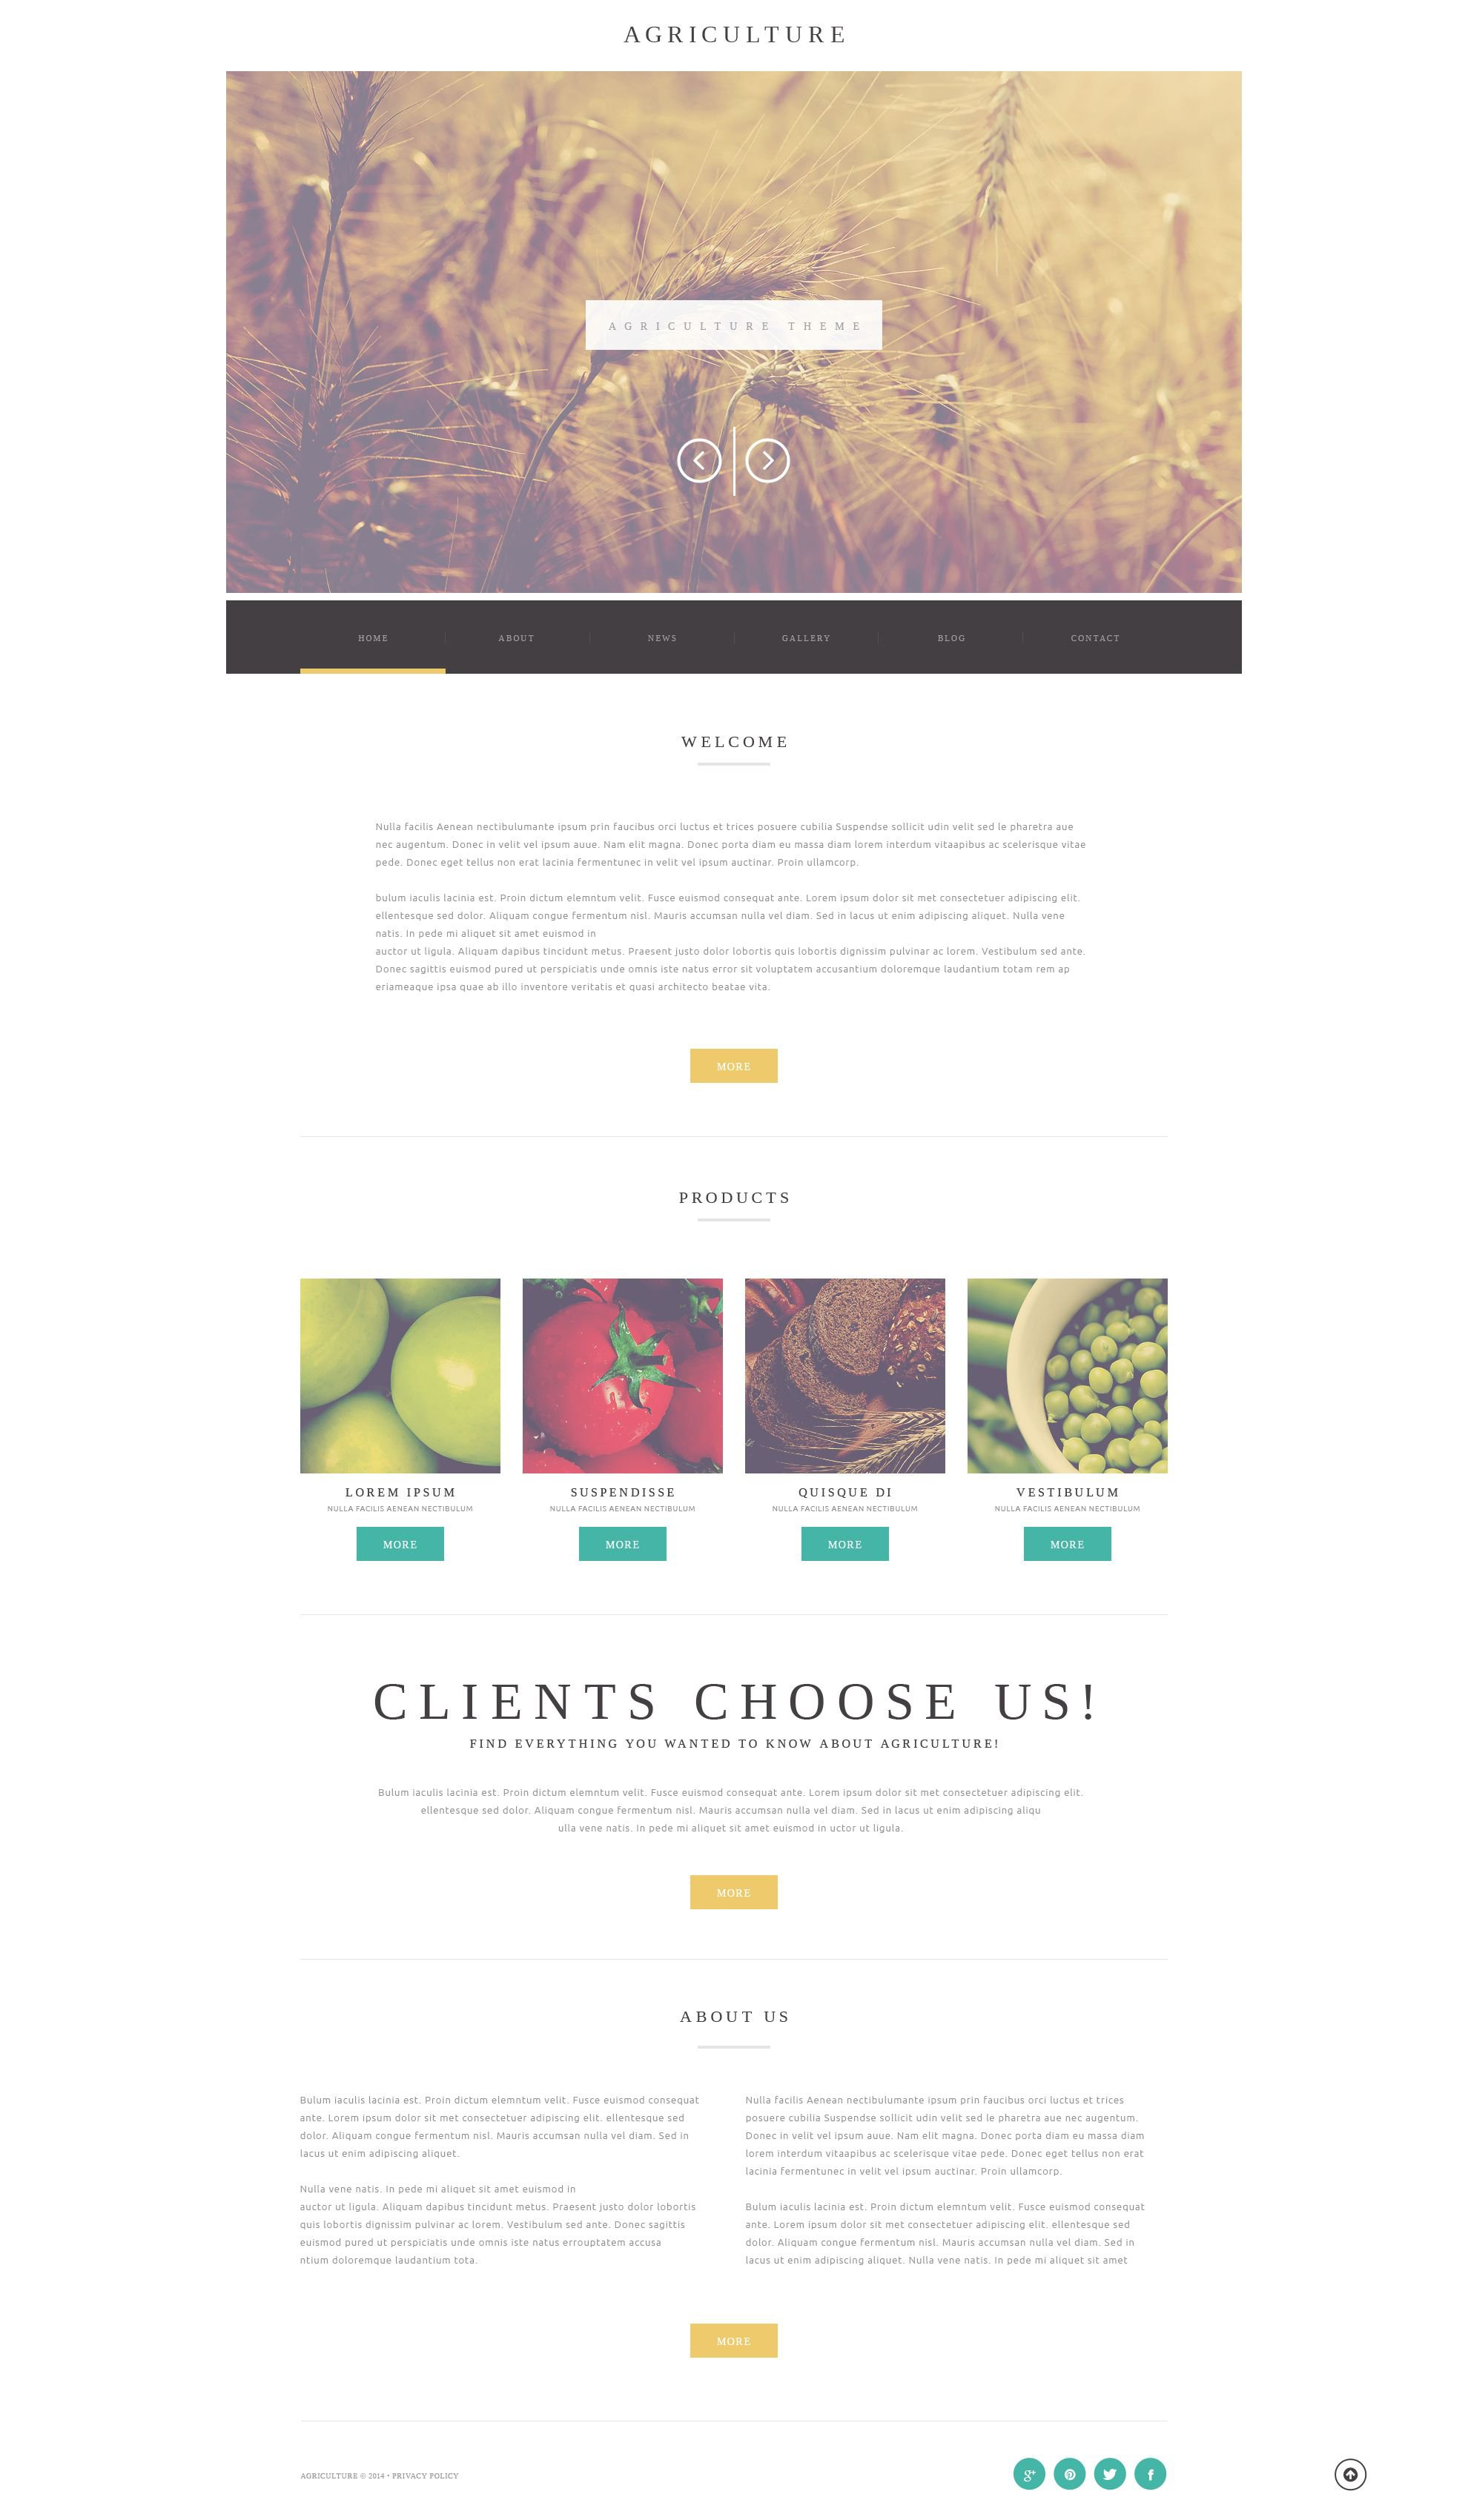 Reszponzív Agriculture Business WordPress sablon 52173